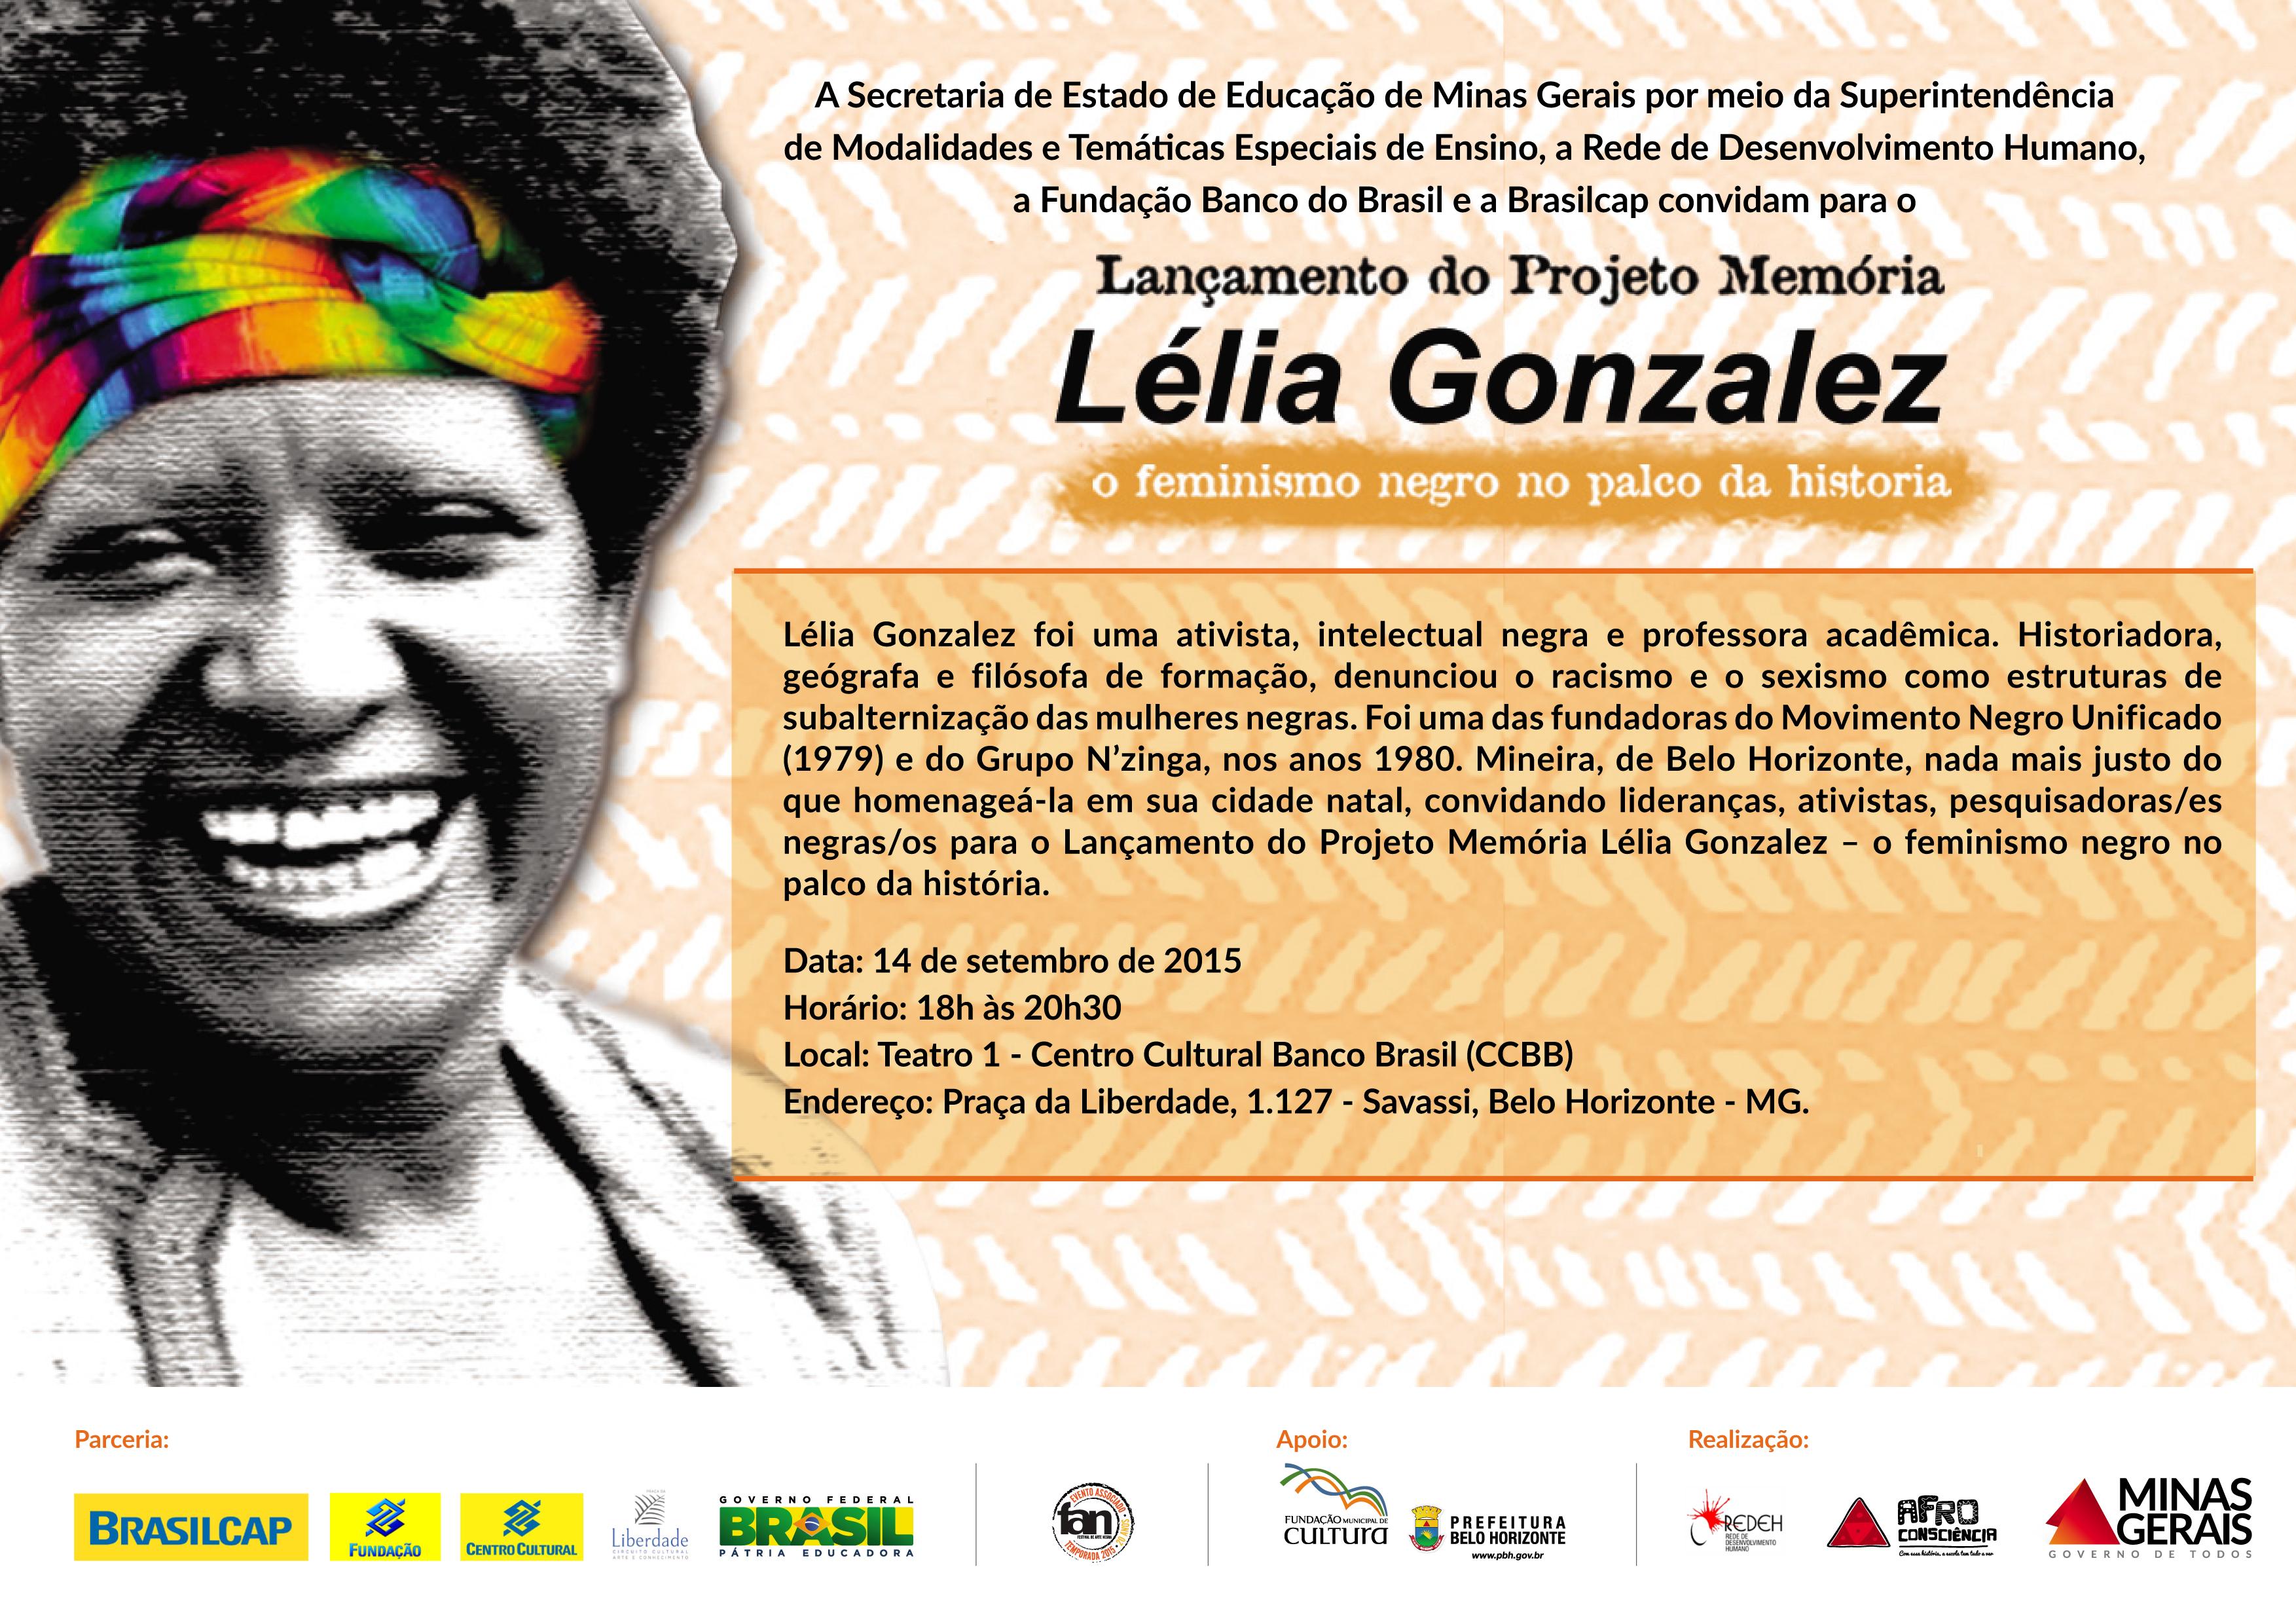 Projeto Memória Lélia Gonzalez